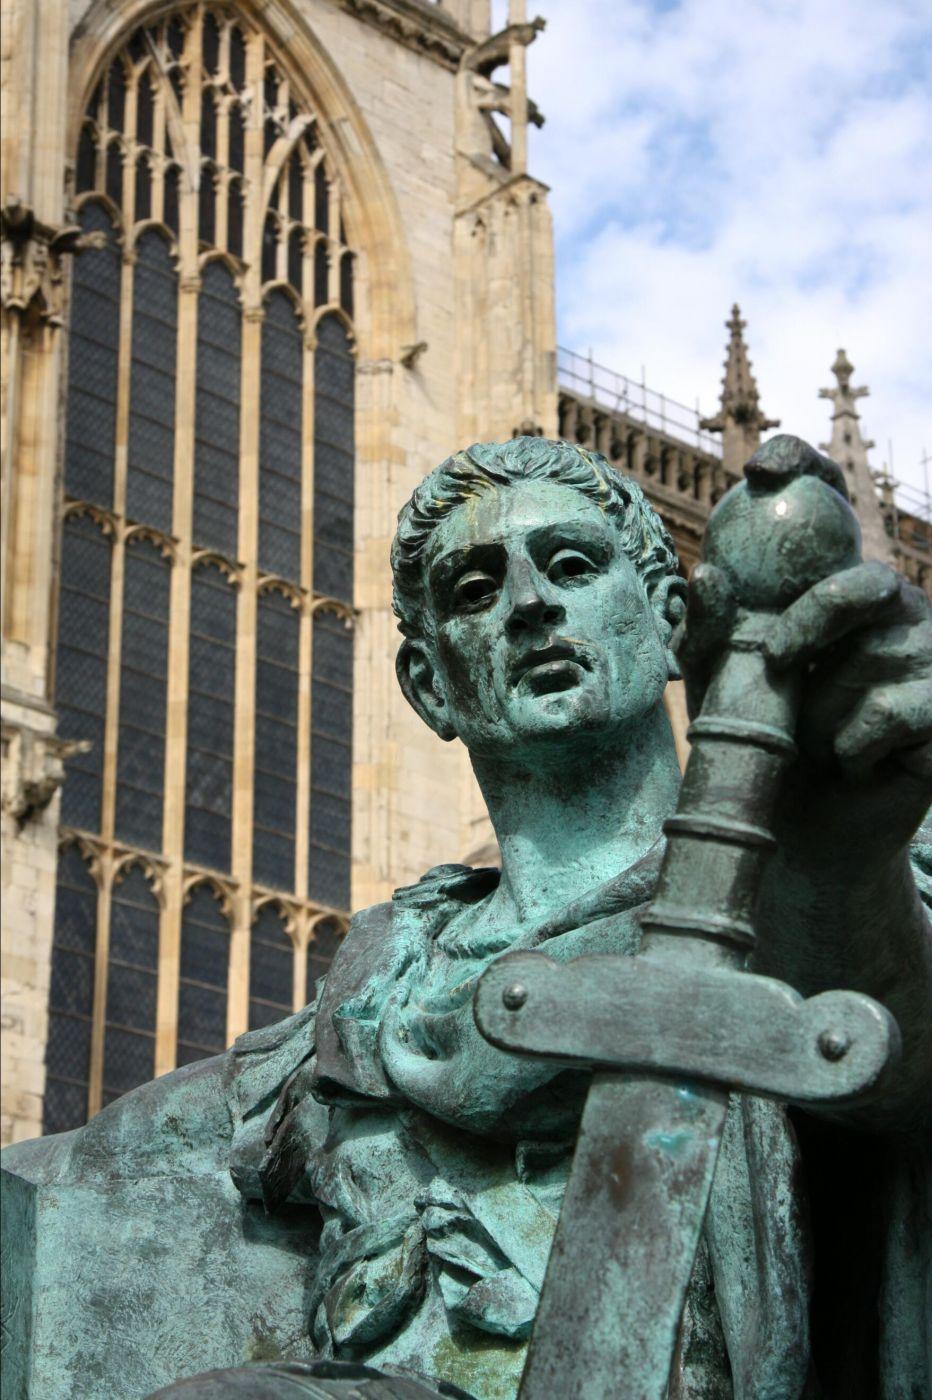 Statue des Kaisers Constantin vor dem York Minster, United Kingdom